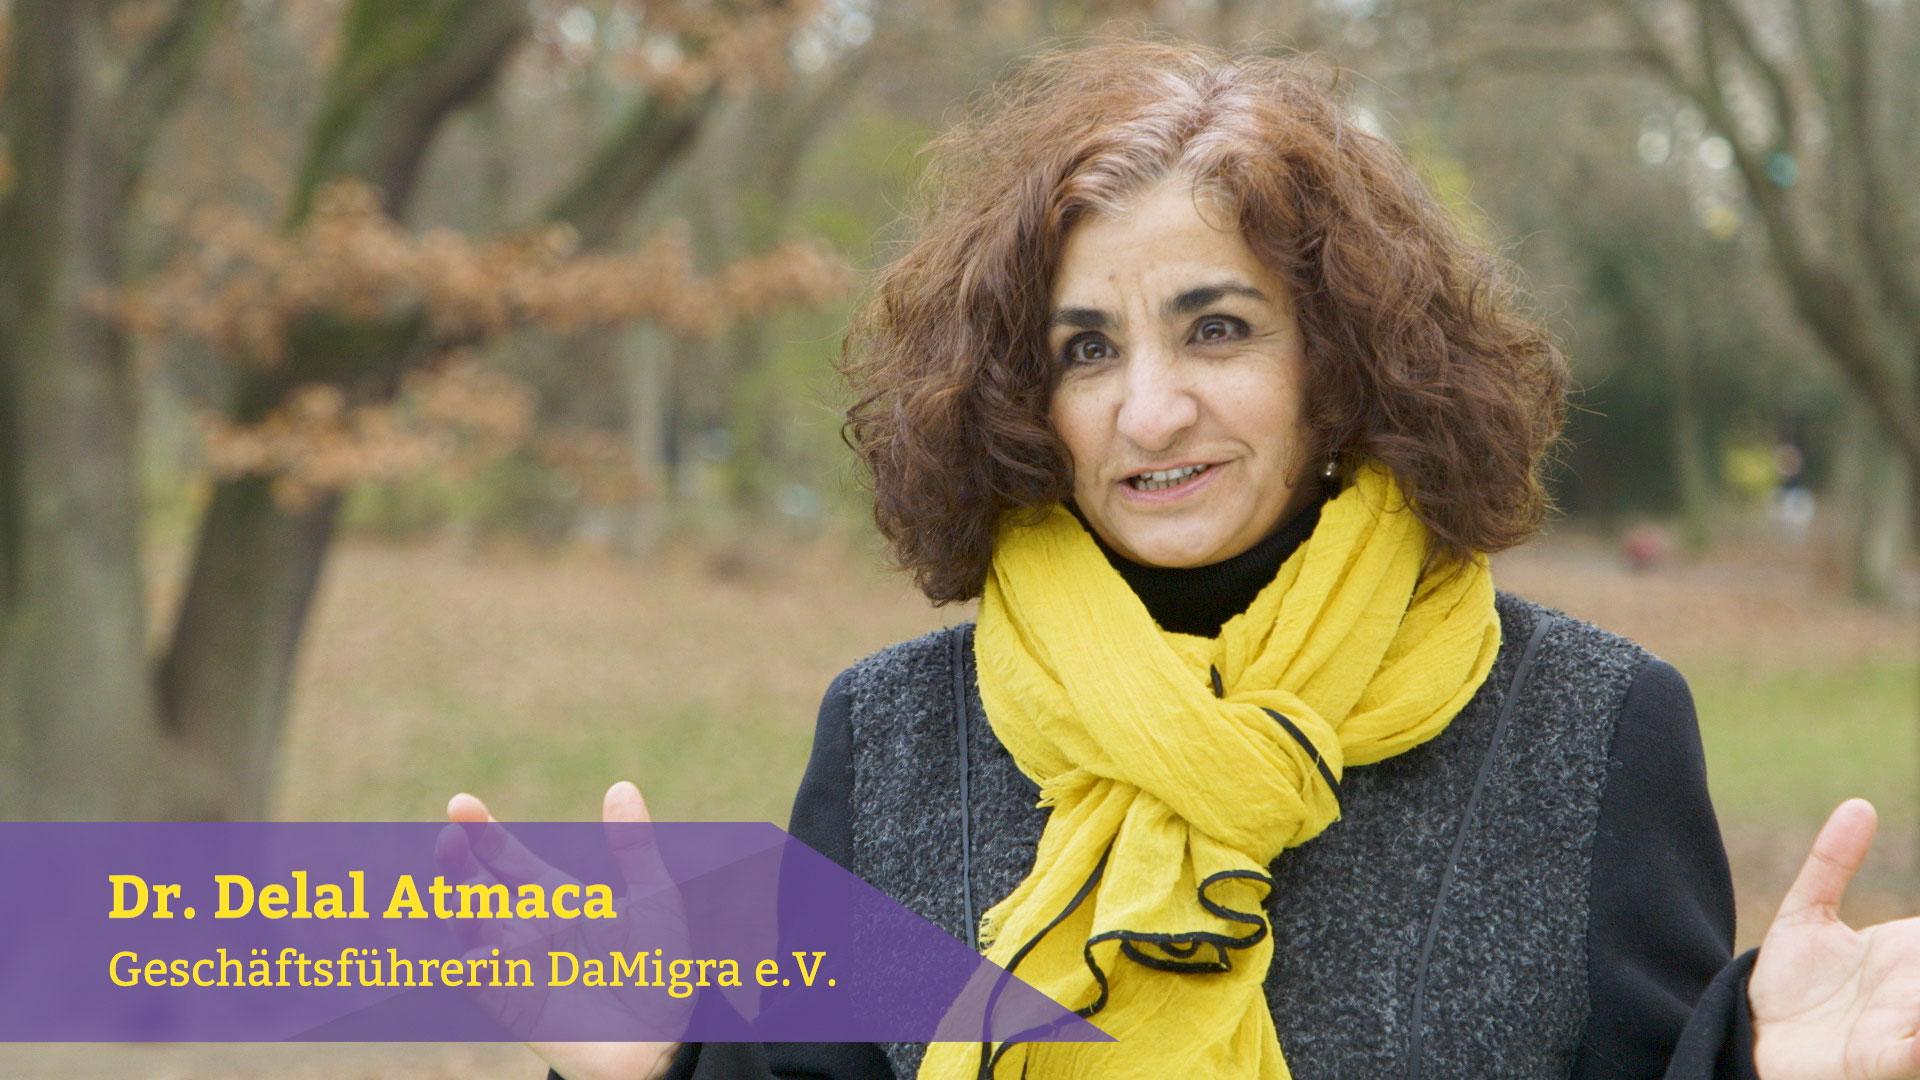 dr-delal-atmaca-im-interview